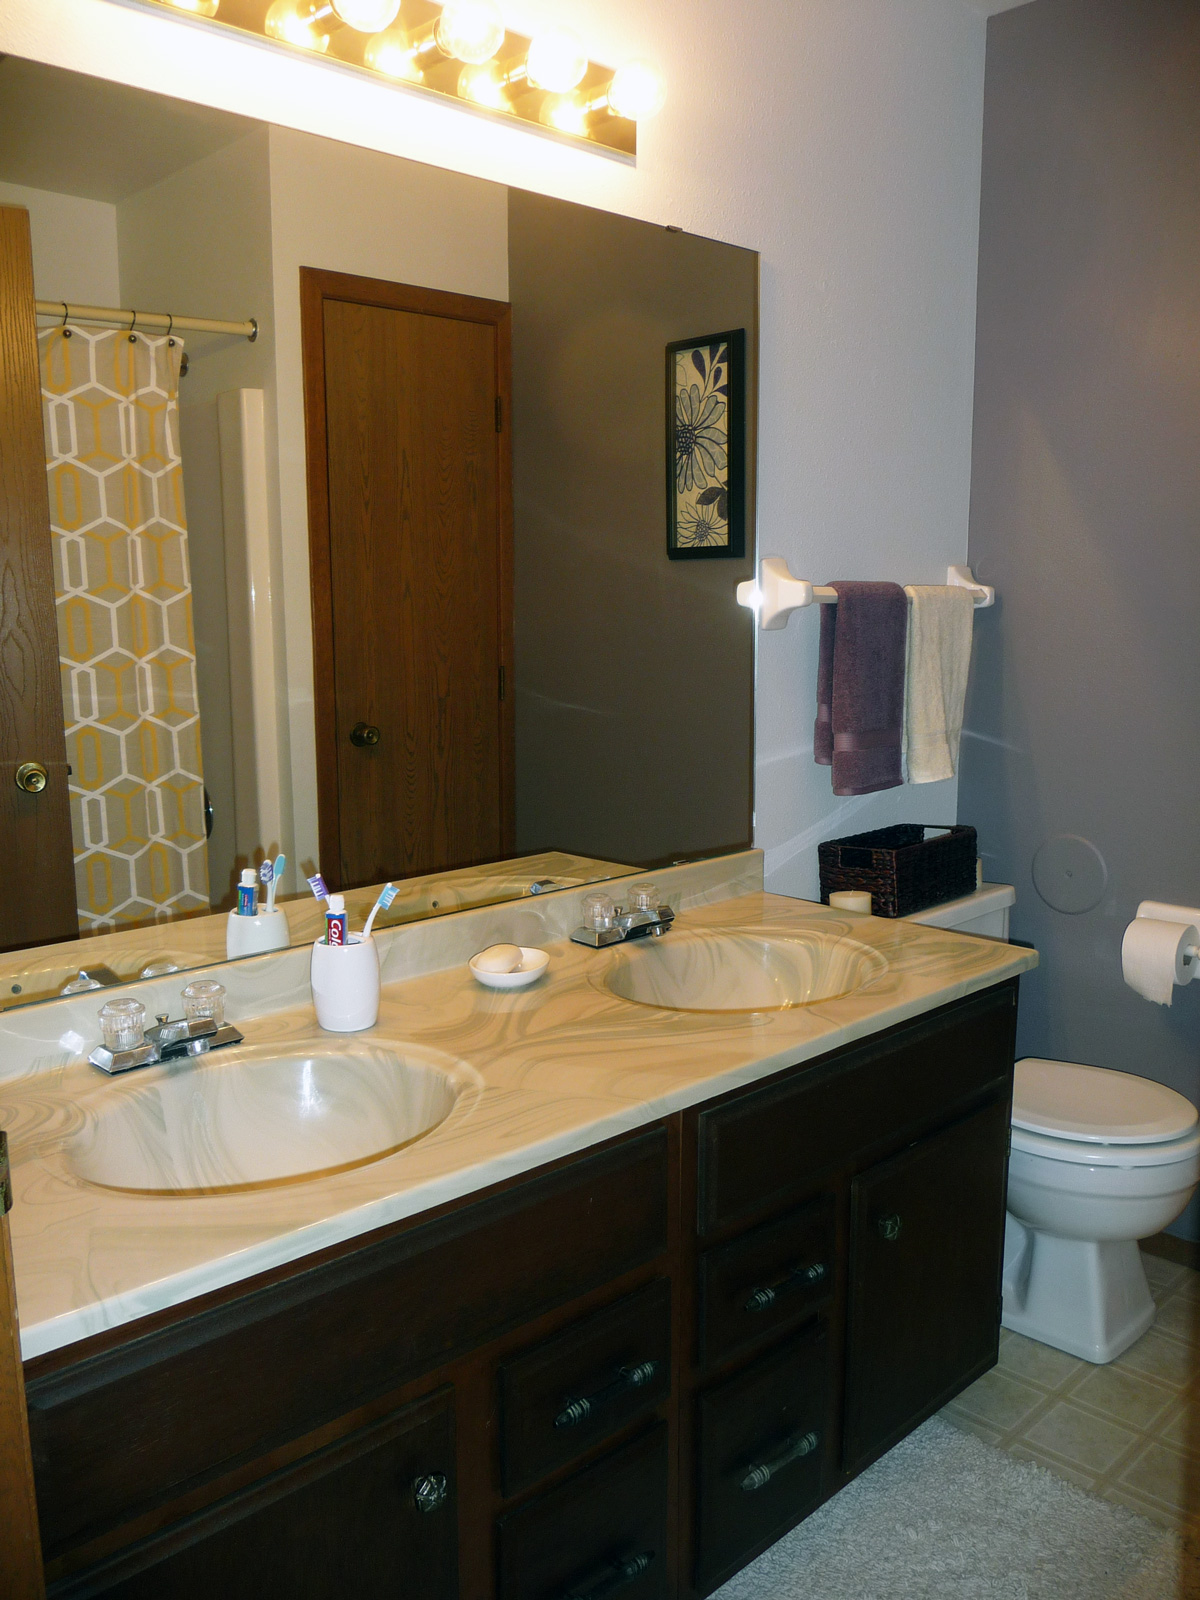 Village green east bathroom munz apartments for Village bathroom photos